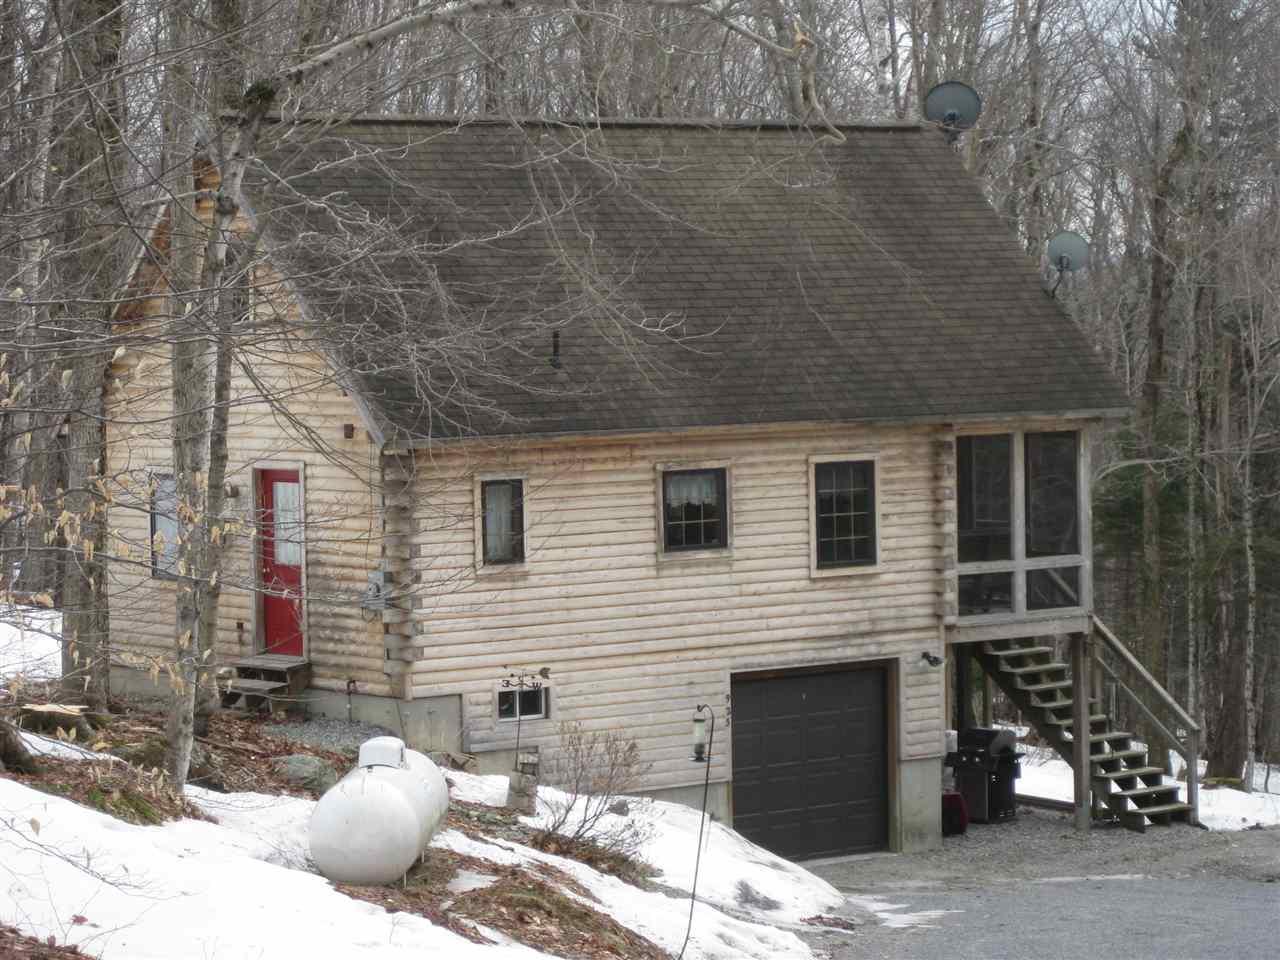 Mount-Snow-Real-Estate-4623147-0